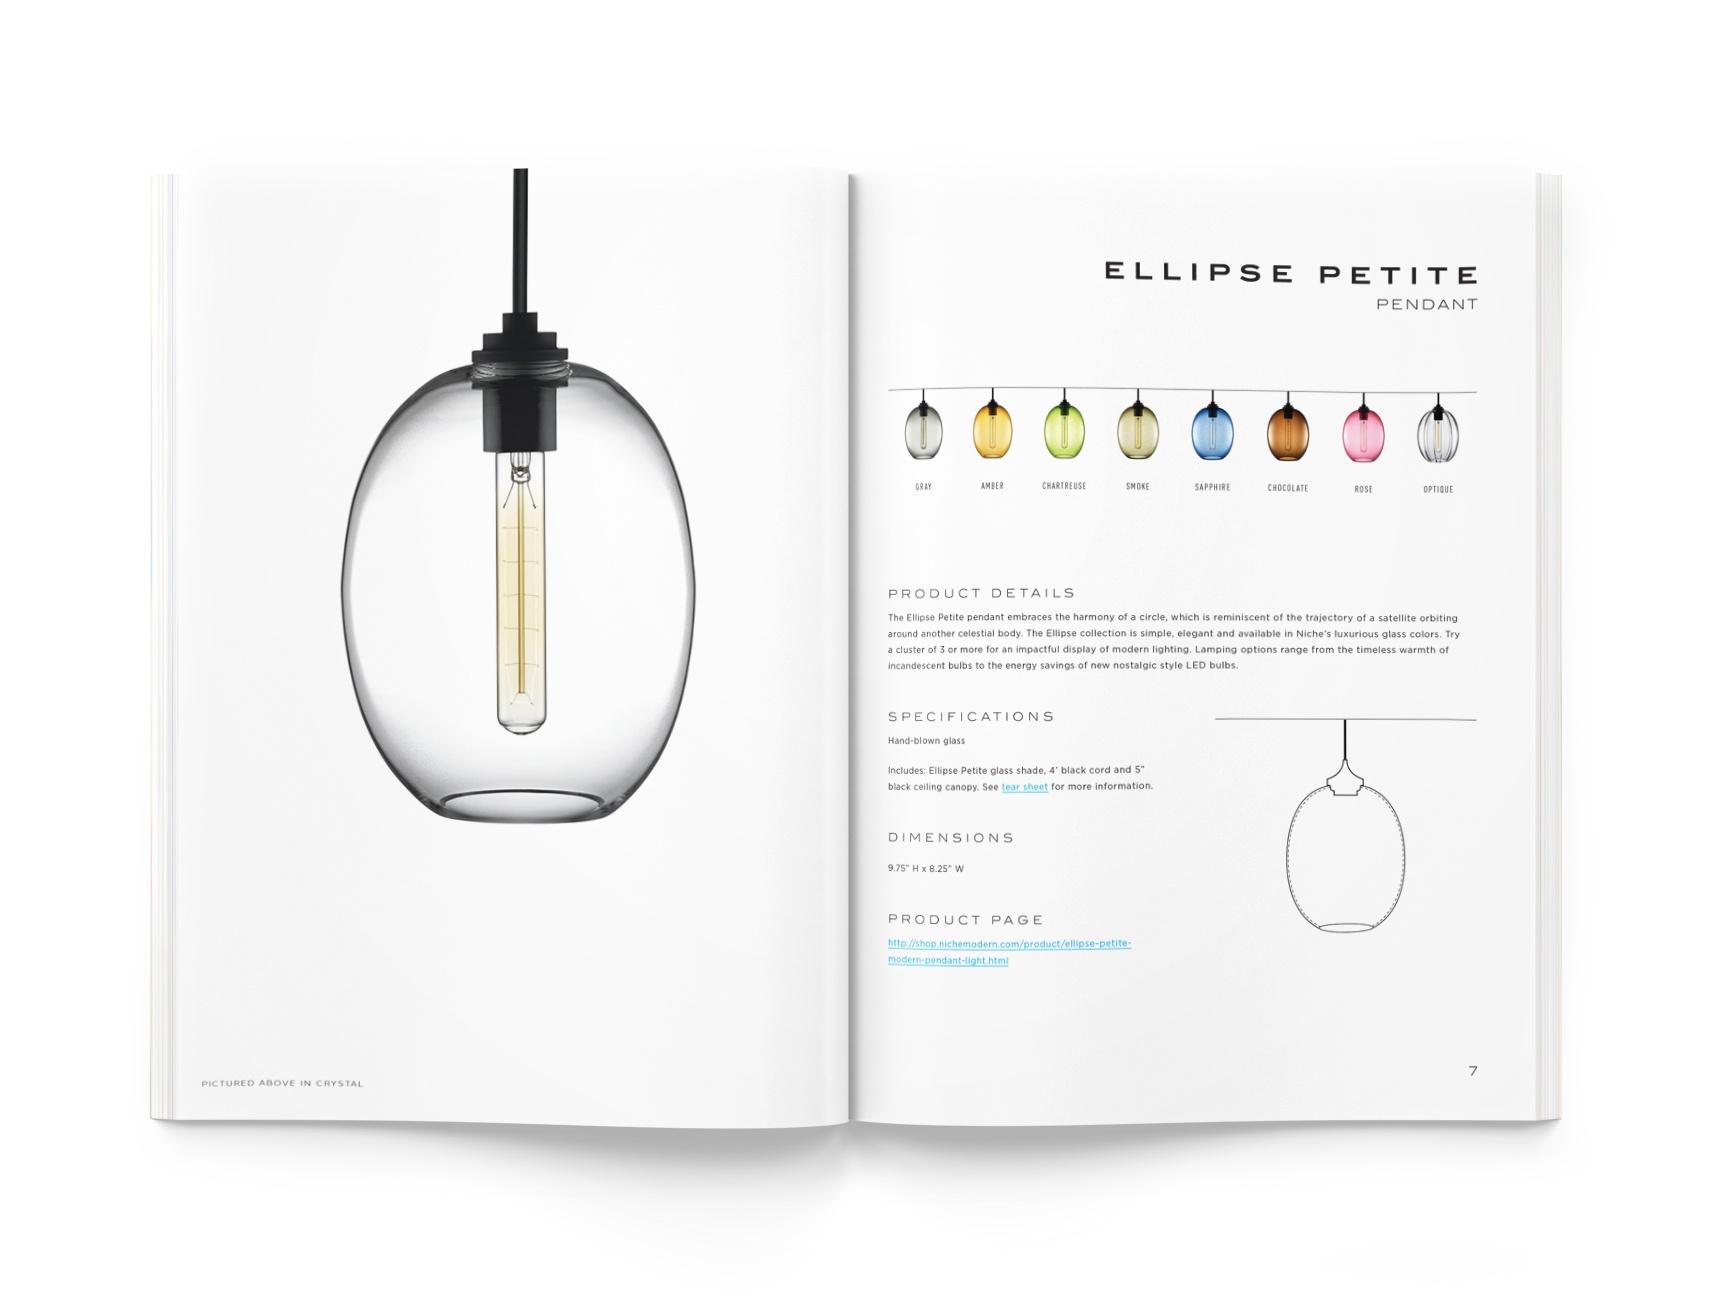 Ellipse Modern Pendant Light Series Guidebook